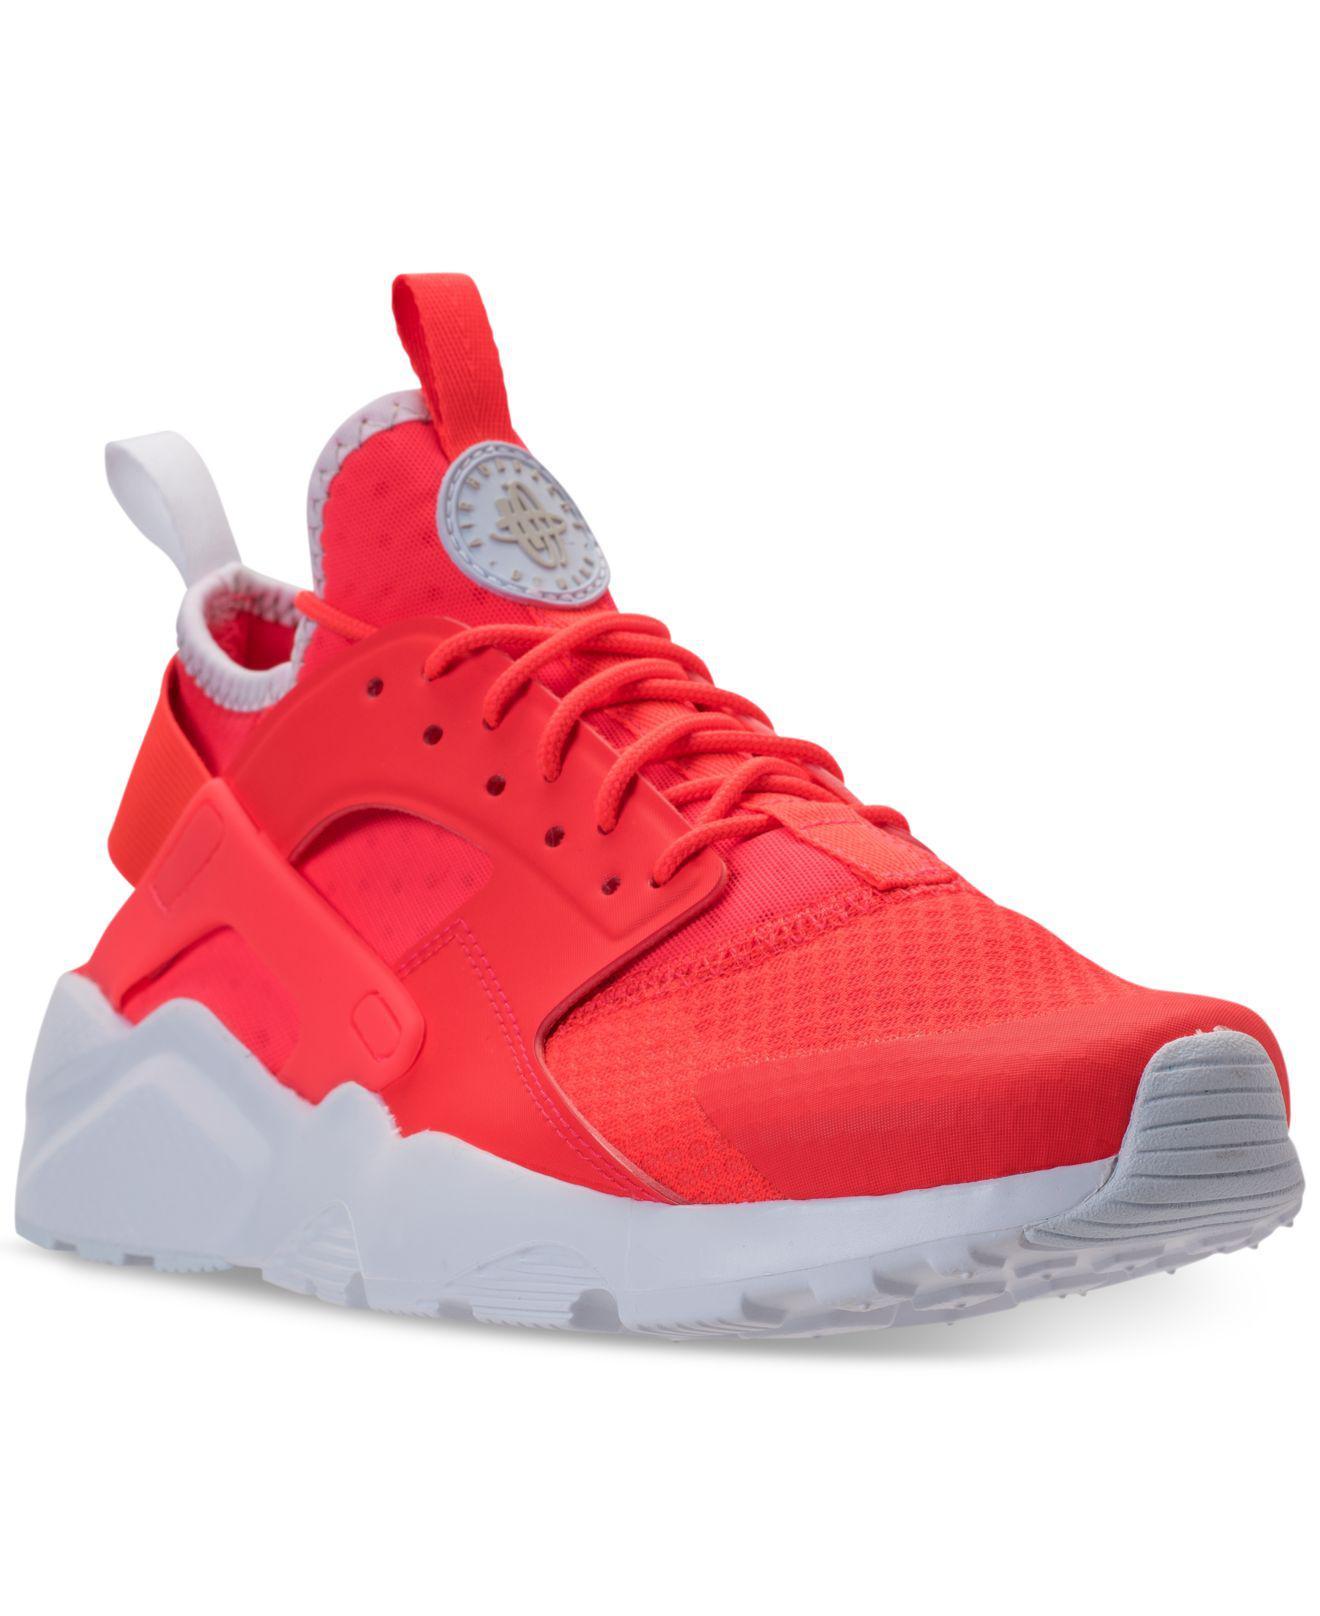 d0ba56633148 Lyst - Nike Air Huarache Run Ultra Running Sneakers From Finish Line ...